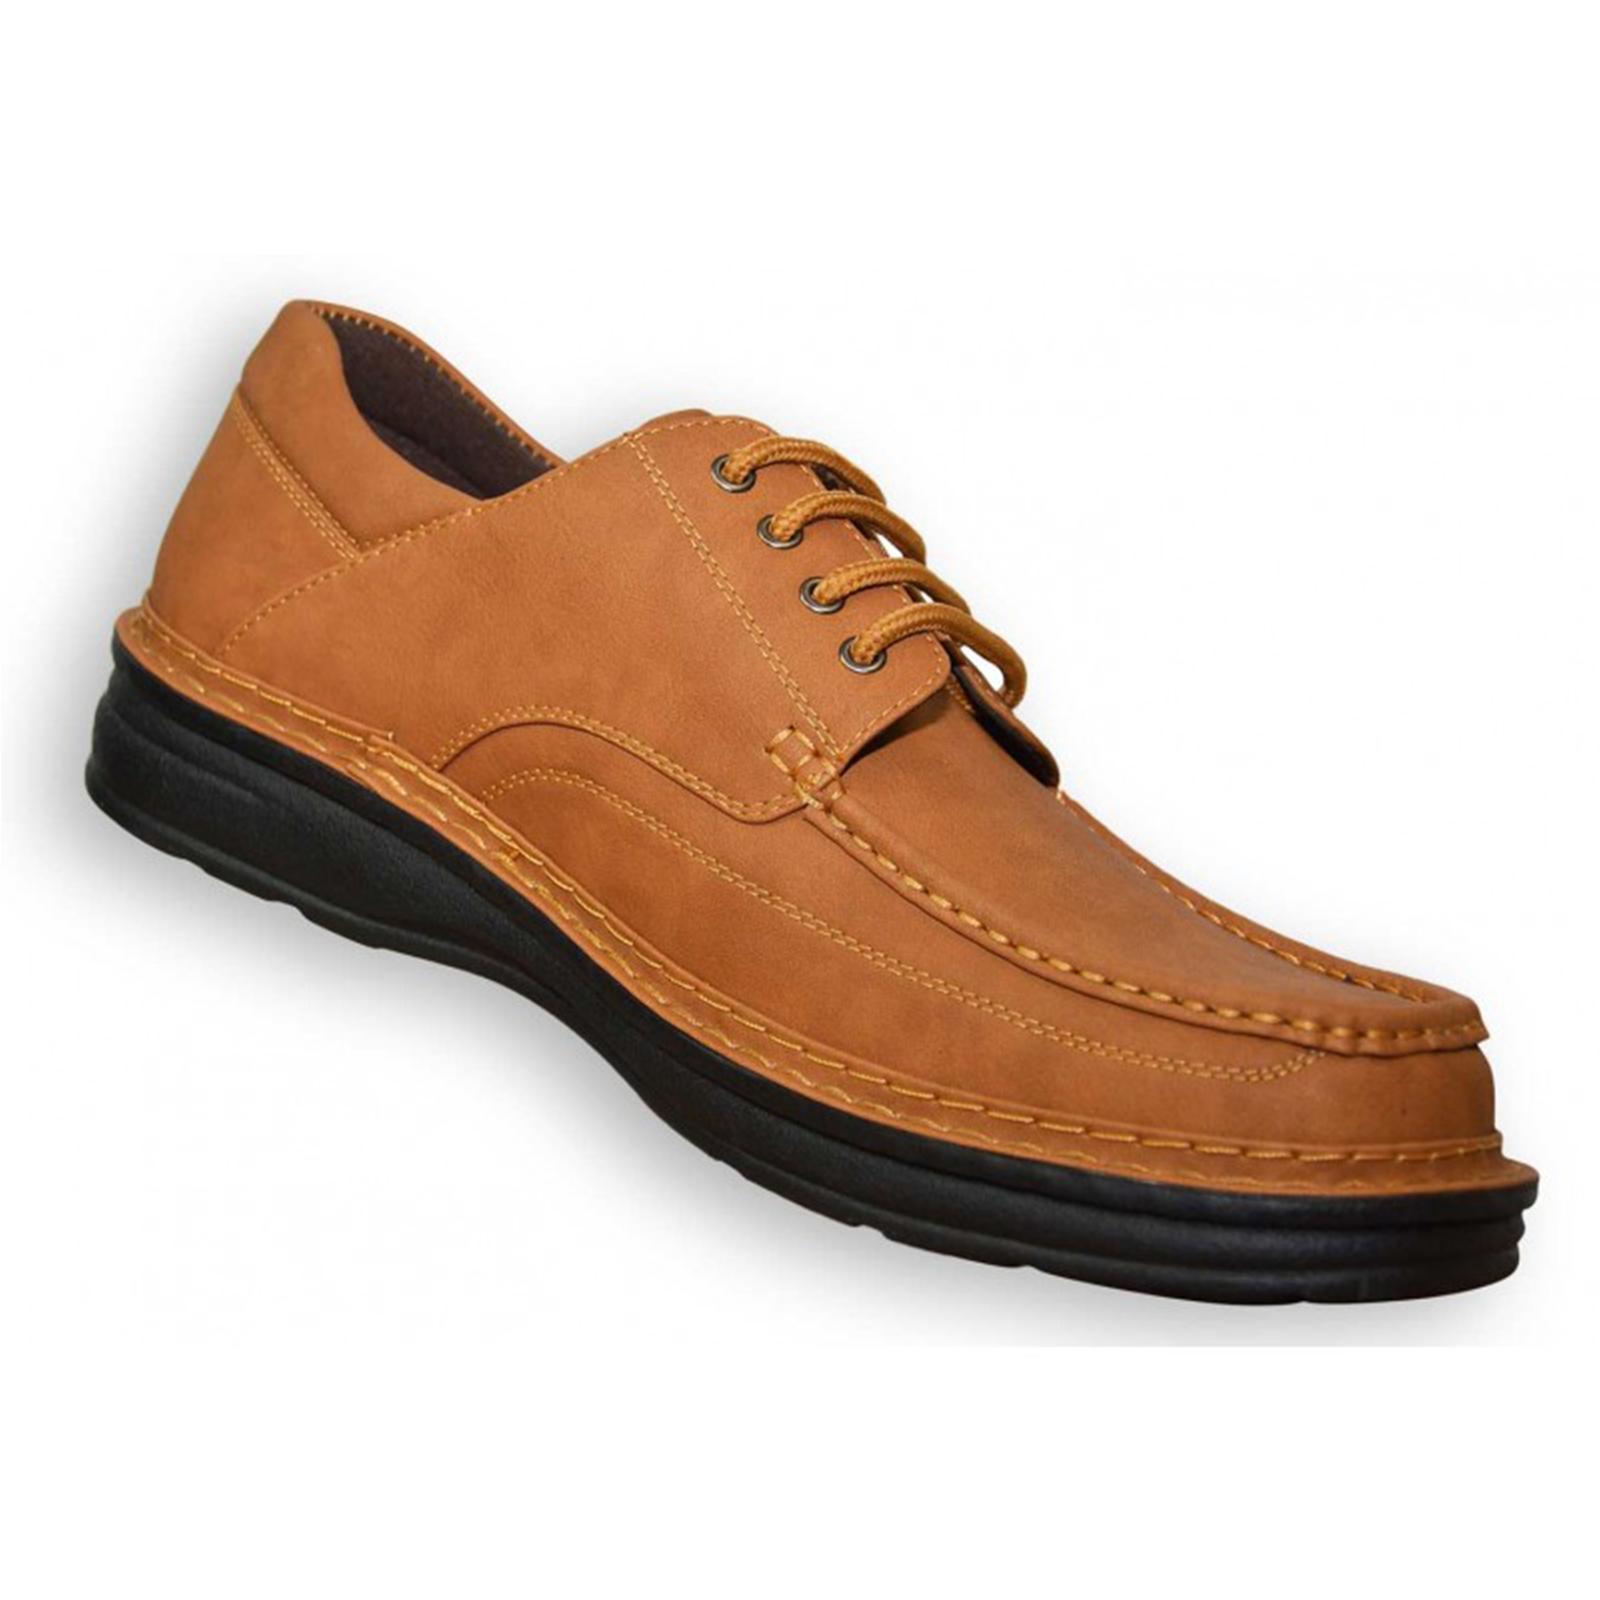 Duke-D555-Keanu-para-hombre-Big-King-Size-Zapatos-Con-Cordones-Calzado-de-Disenador-de-Cuero-PU miniatura 7